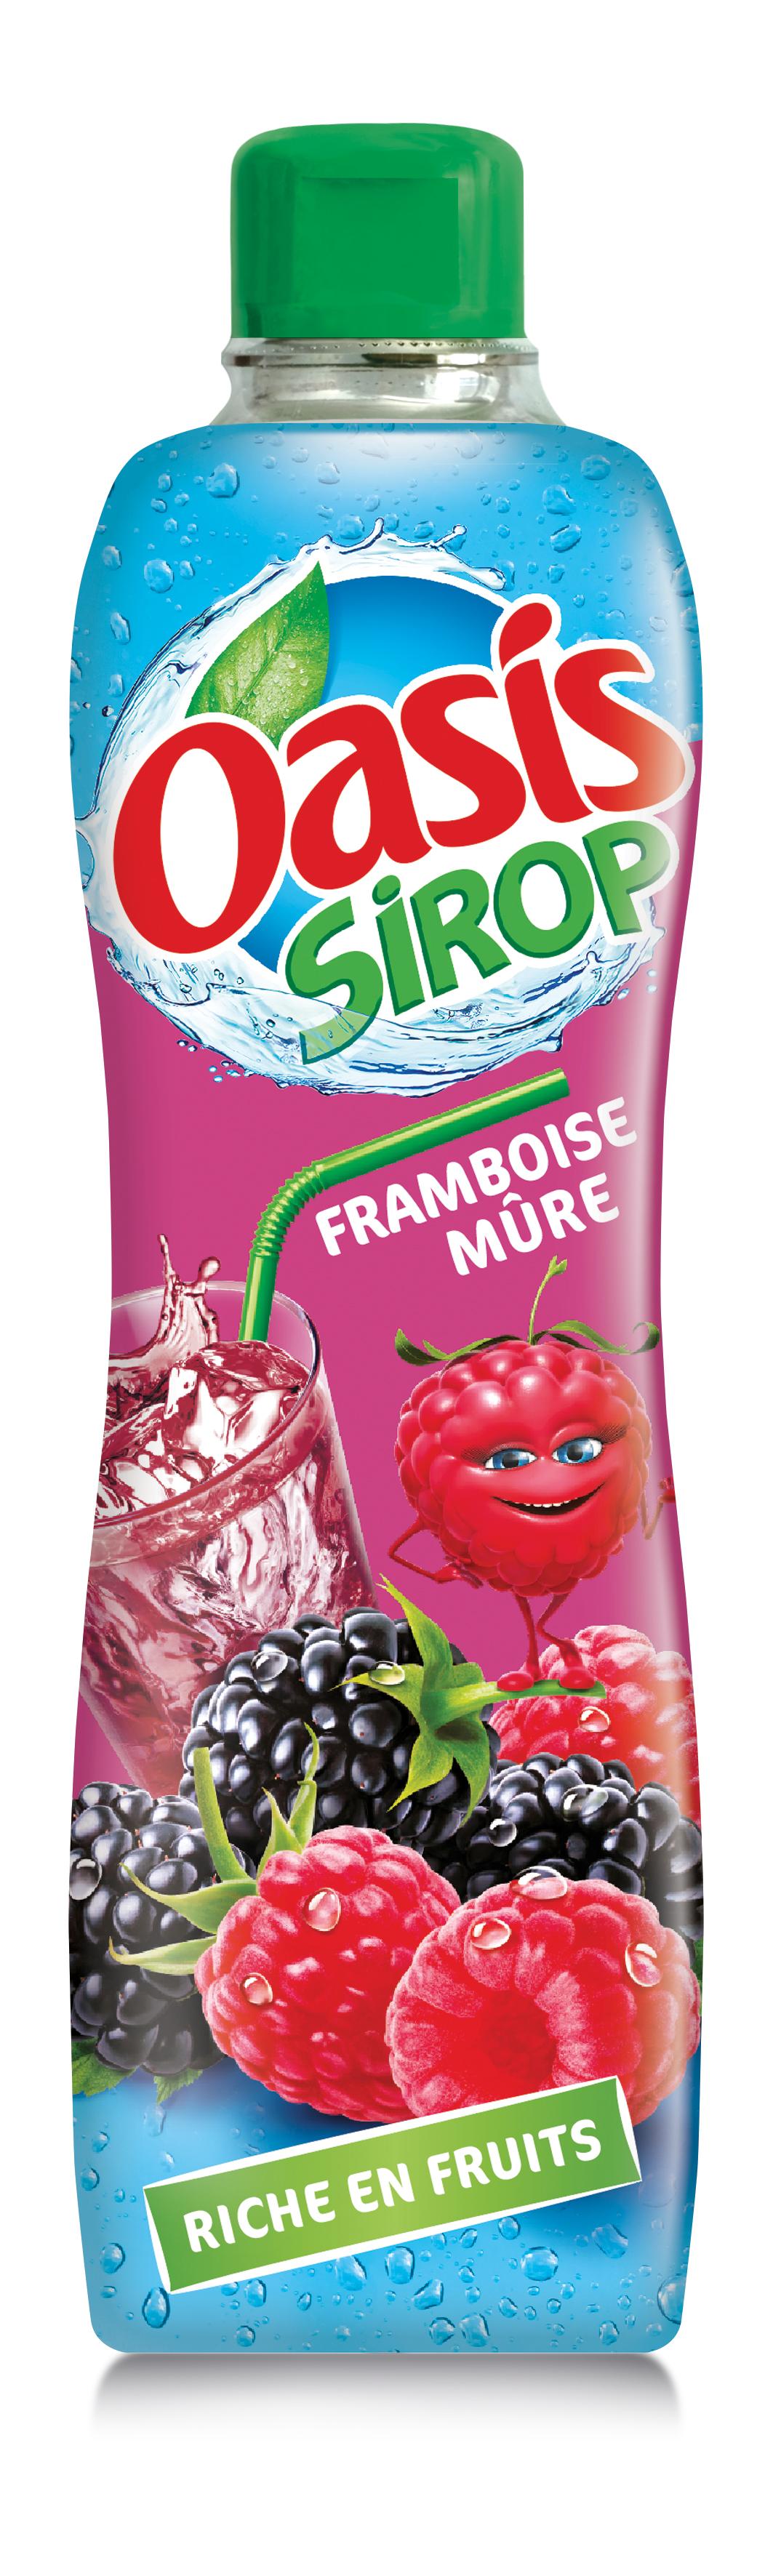 Framboise mure - Oasis lance sa première gamme de sirops